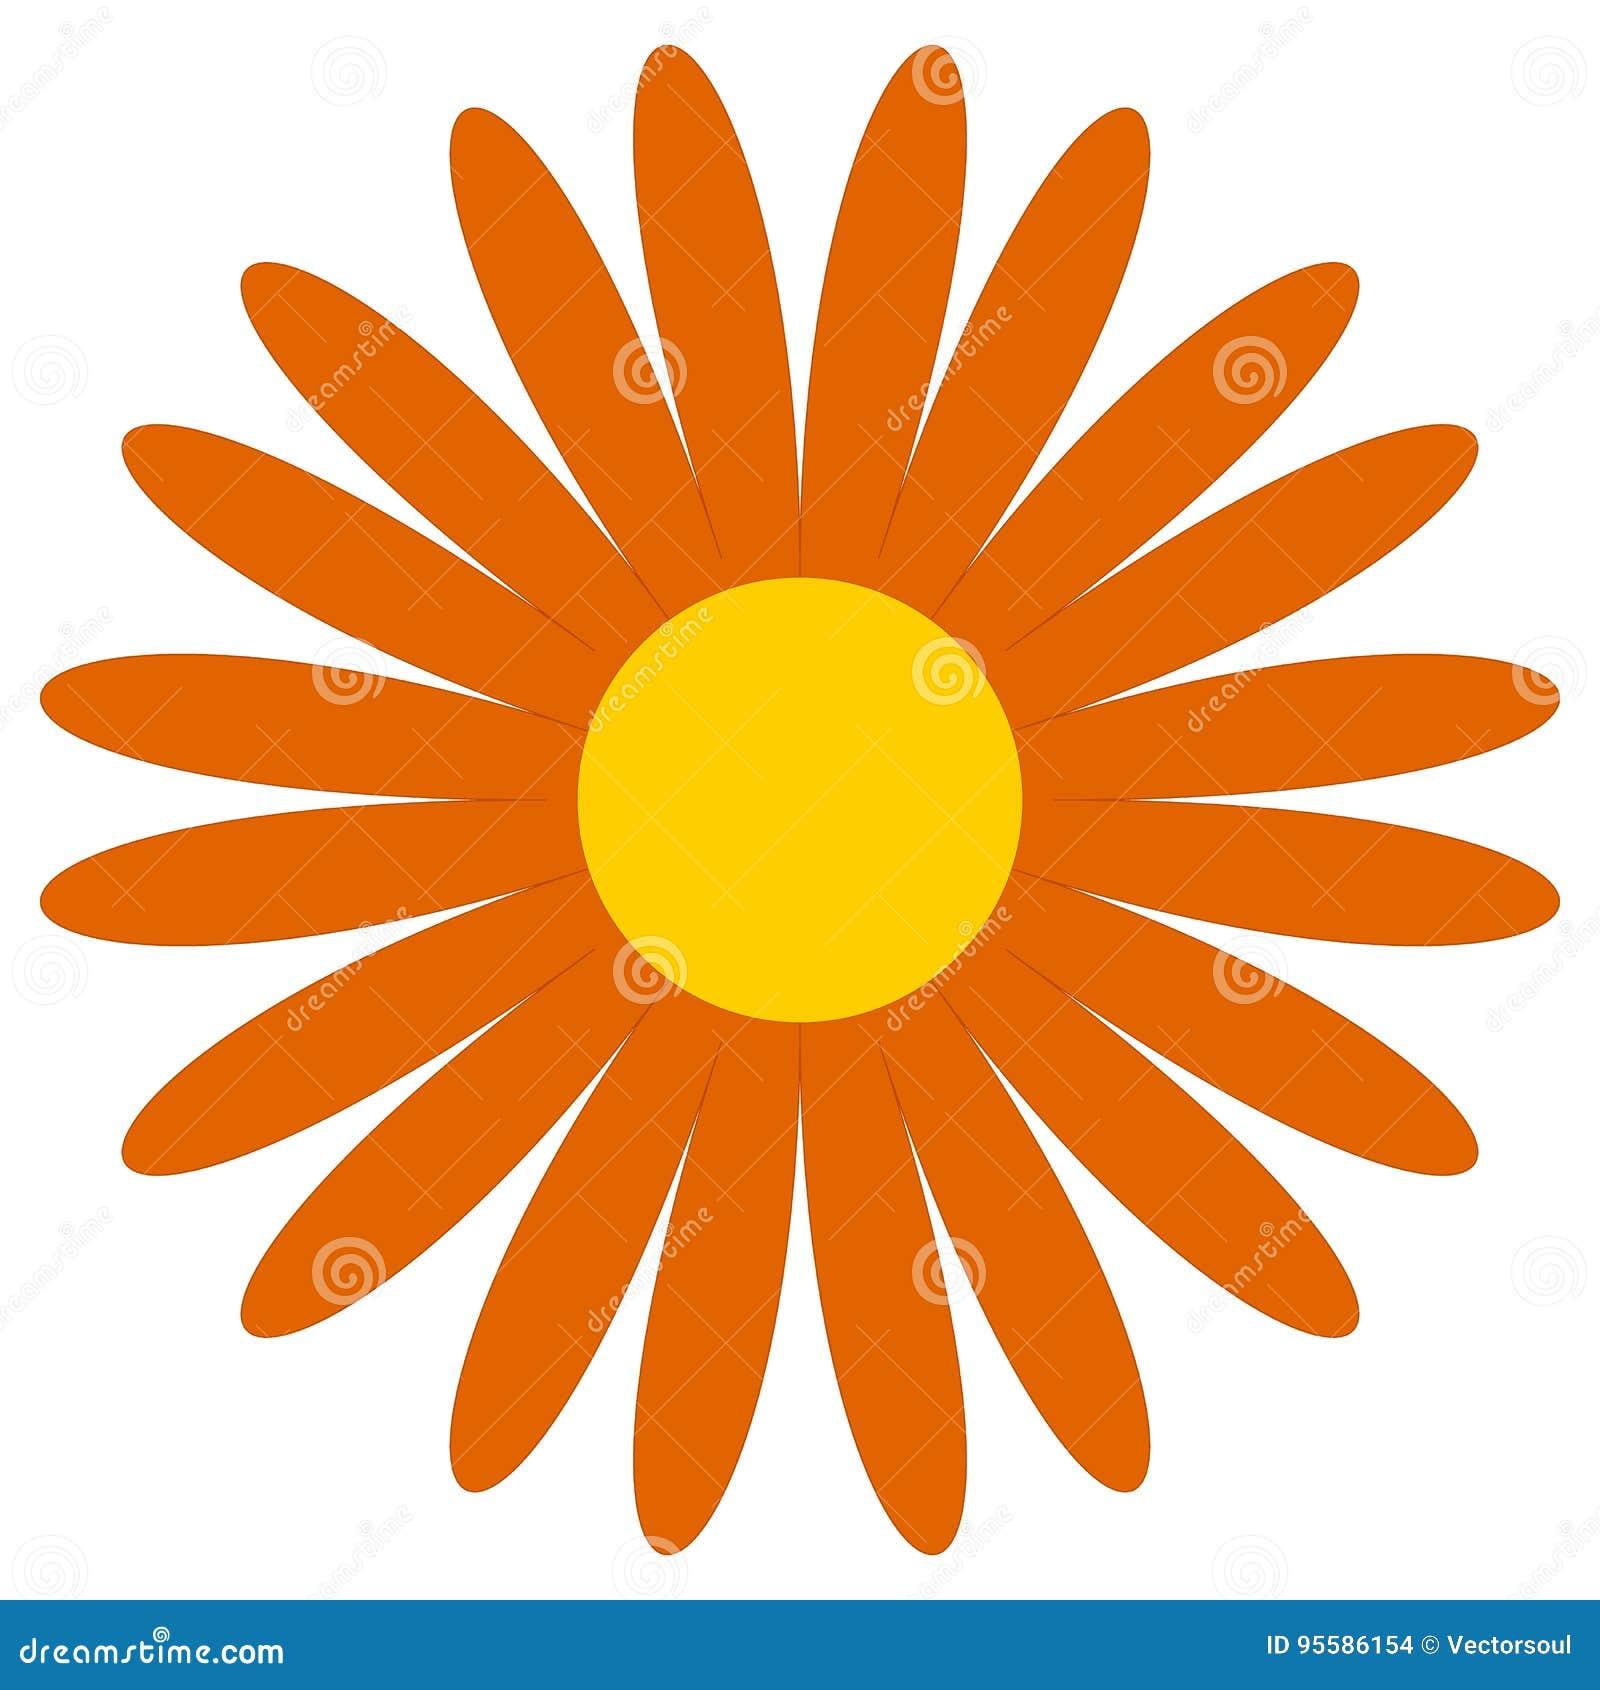 Classic Flower Clip Art Simple Orange Daisy Flower Icon Symbo